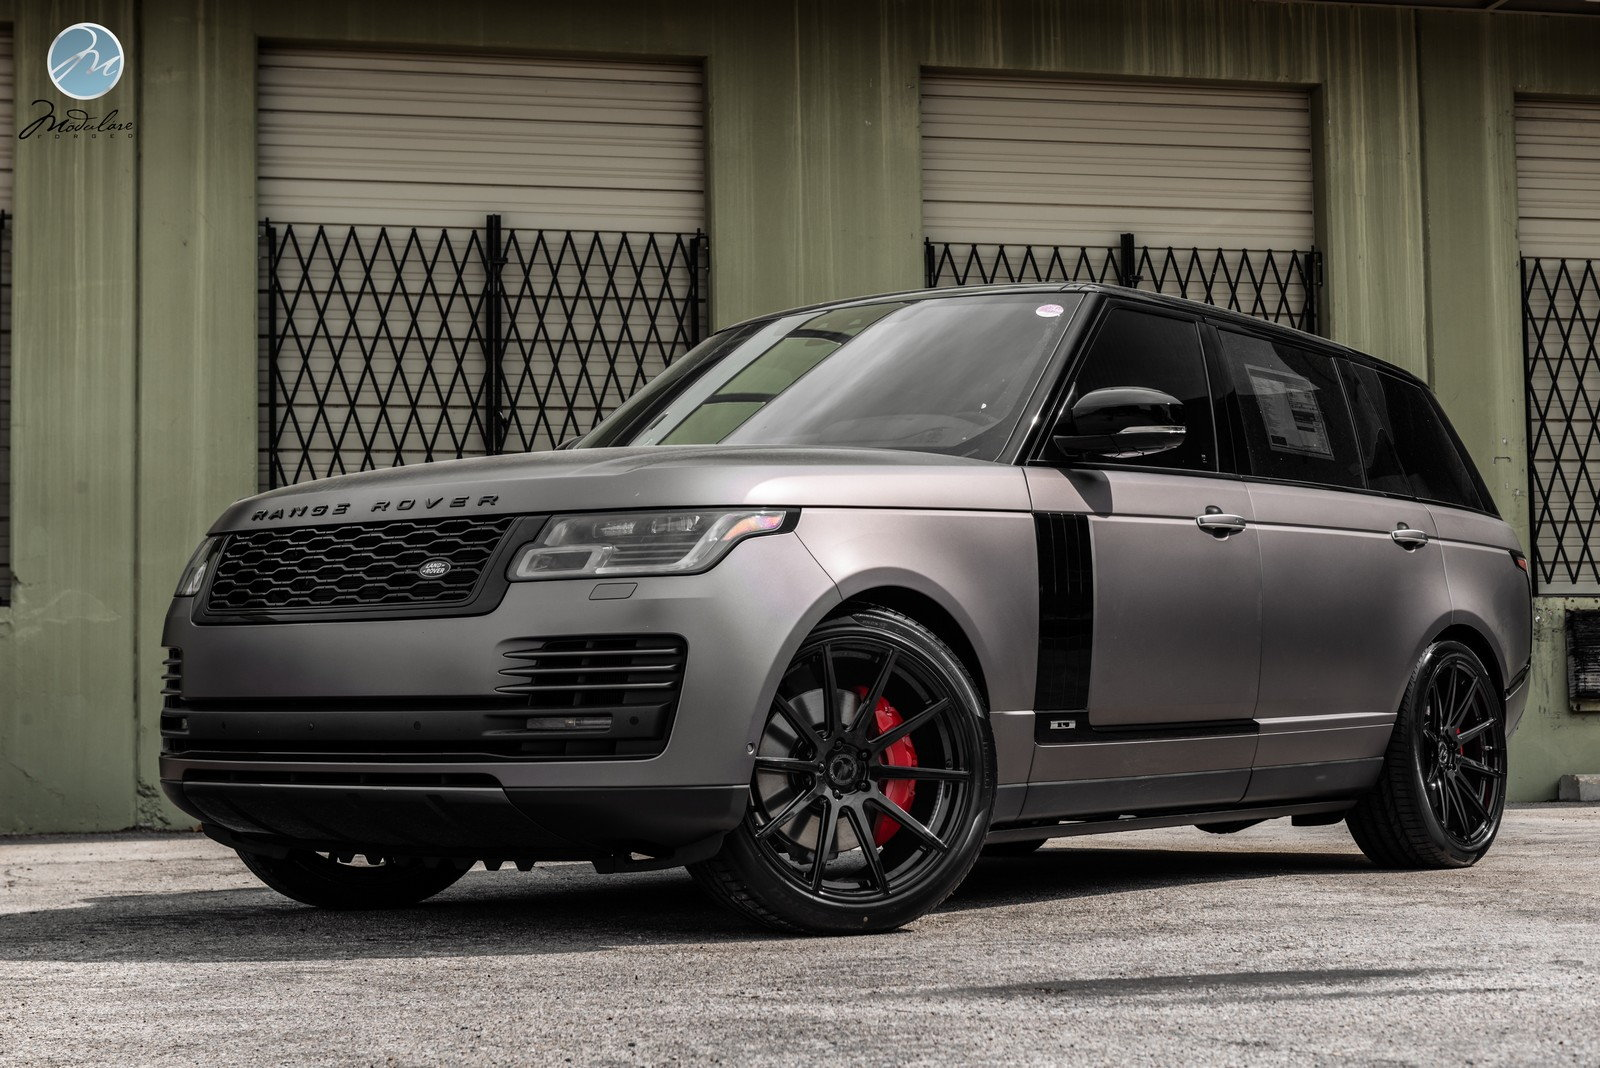 "Matte Range Rover >> 2018 Range Rover LWB Matte Grey   22"" Modulare B15 - Teamspeed.com"